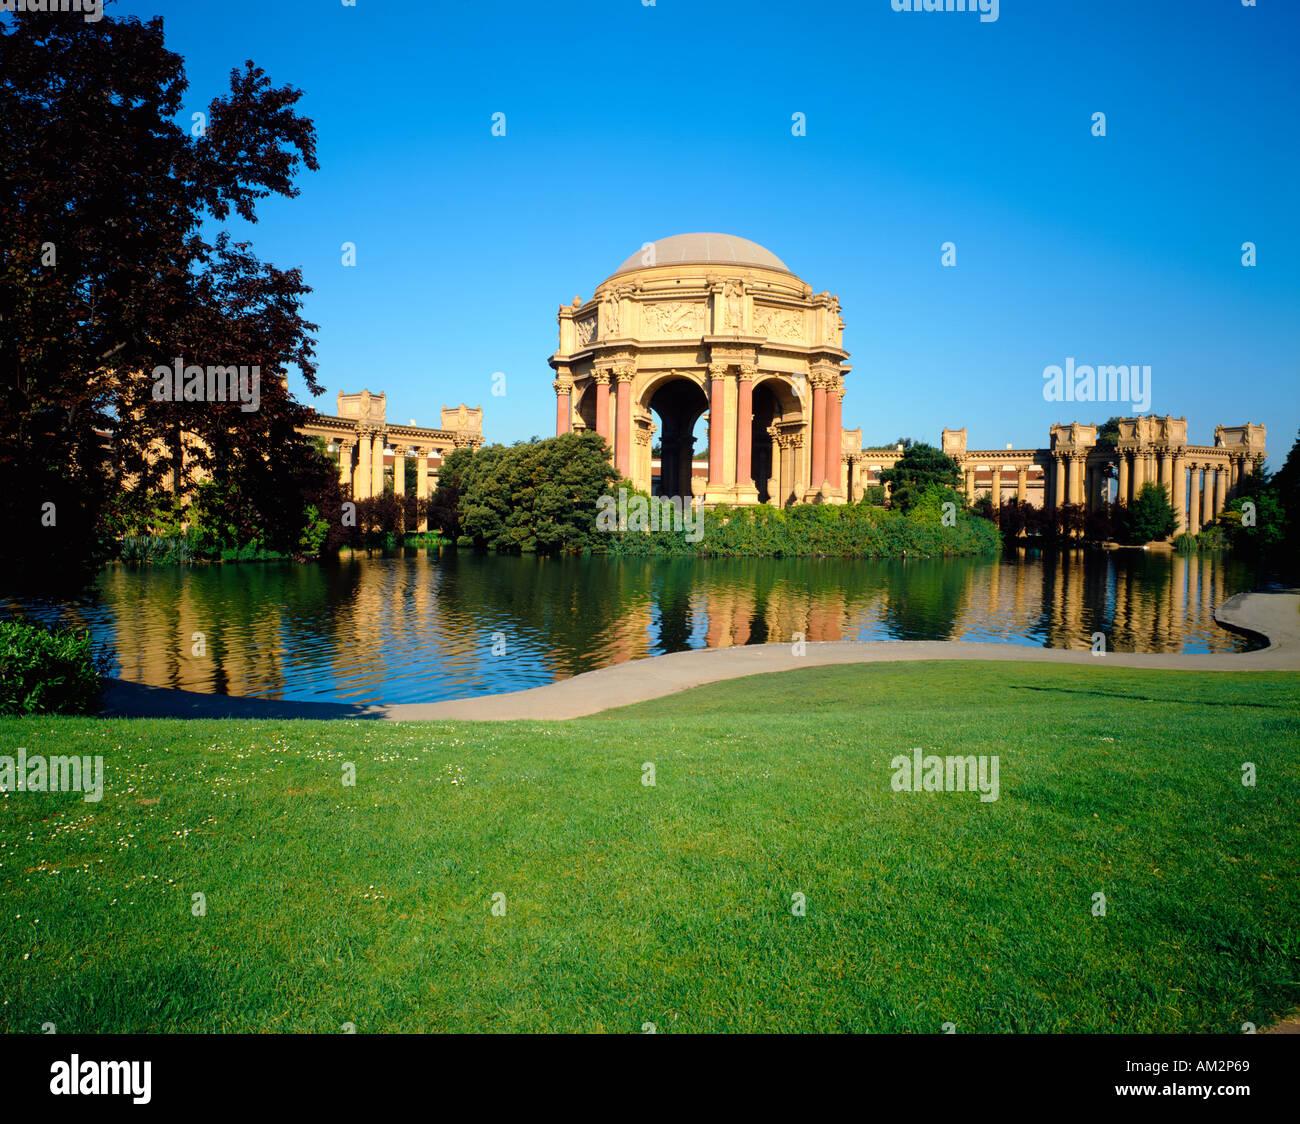 Palace of Fine Arts in San Francisco Kalifornien, USA Stockbild